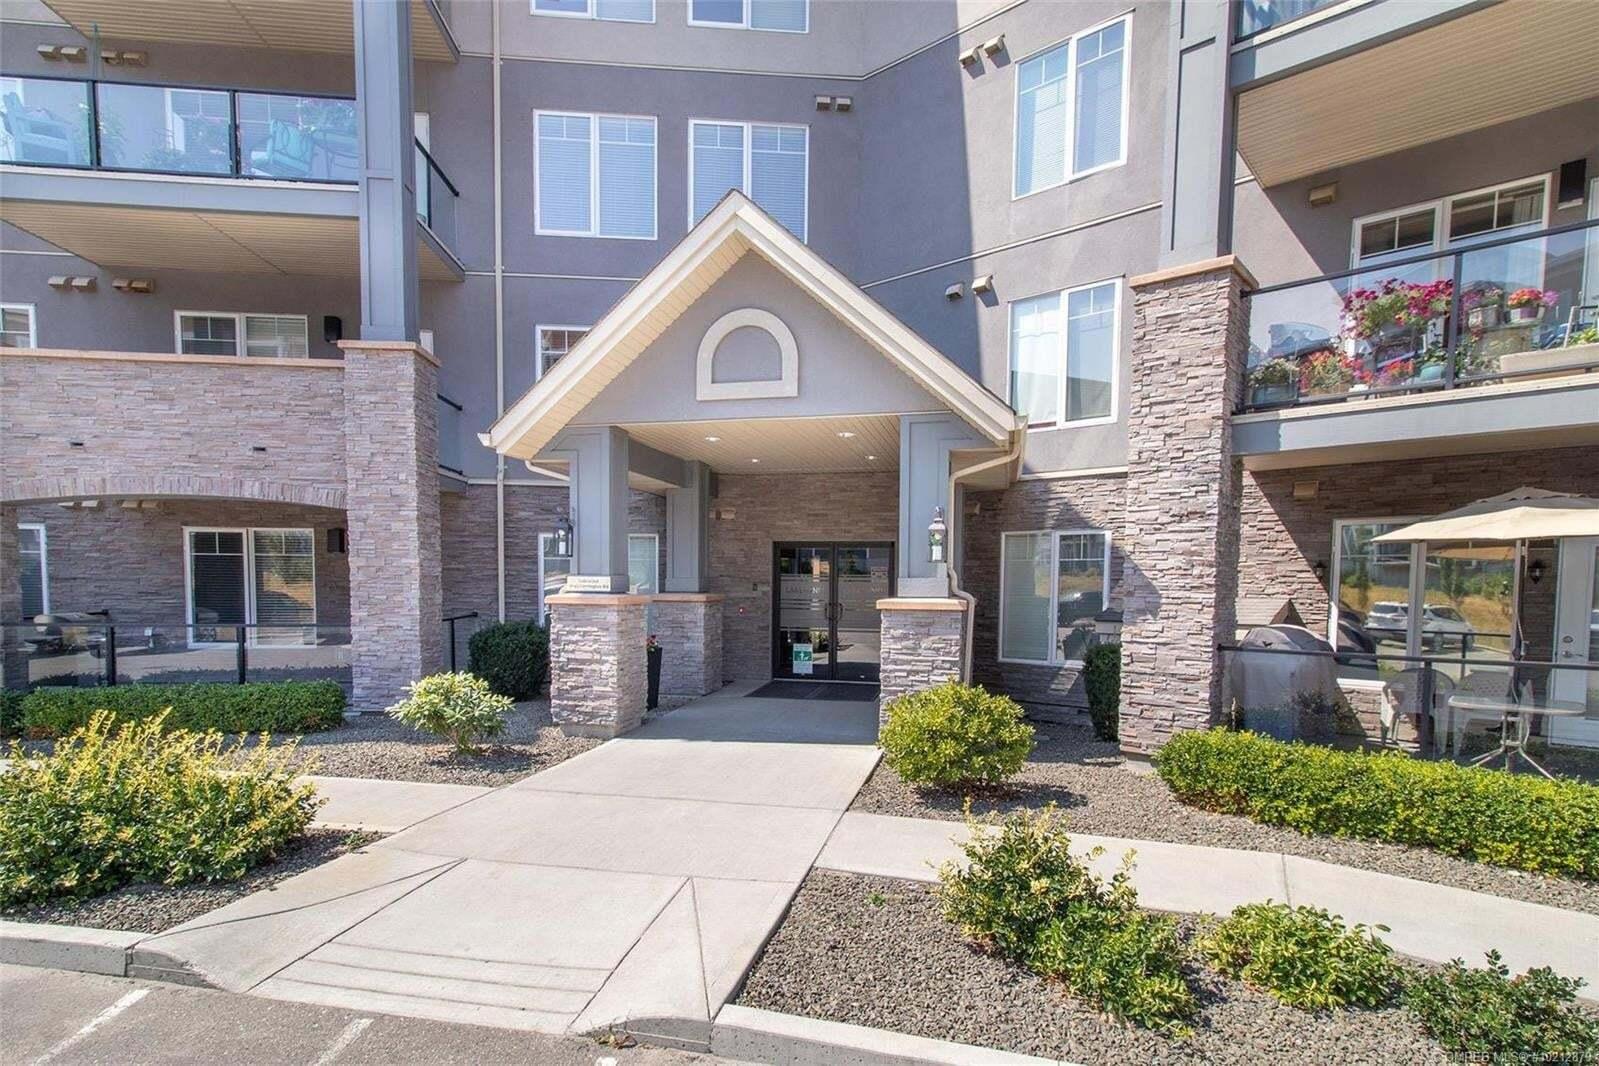 Condo for sale at 3645 Carrington Rd West Kelowna British Columbia - MLS: 10212879